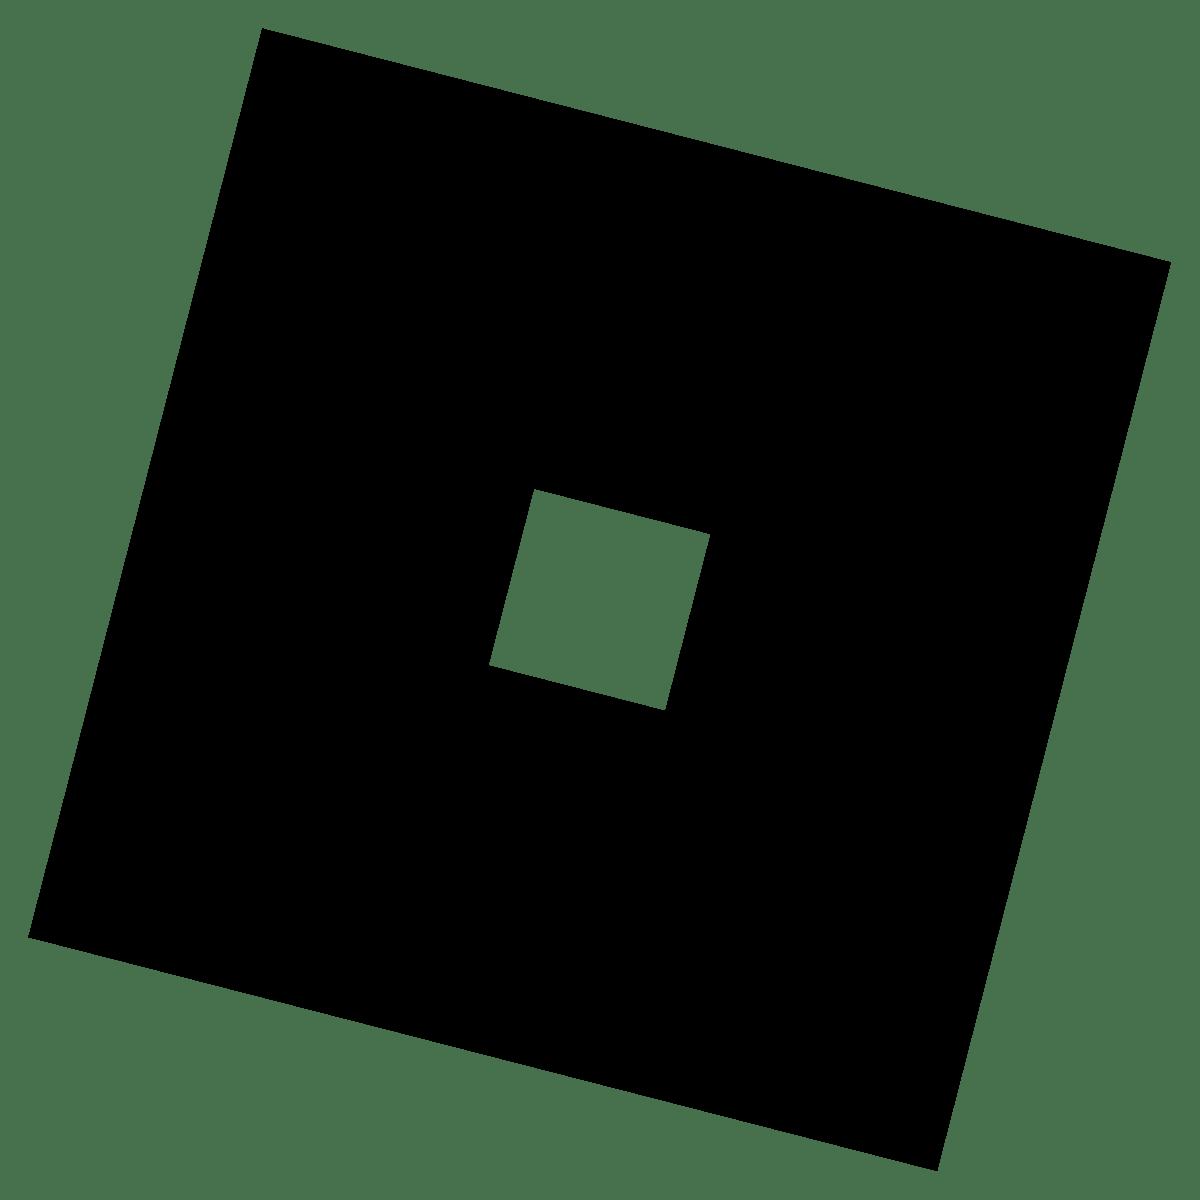 Roblox Crunchbase